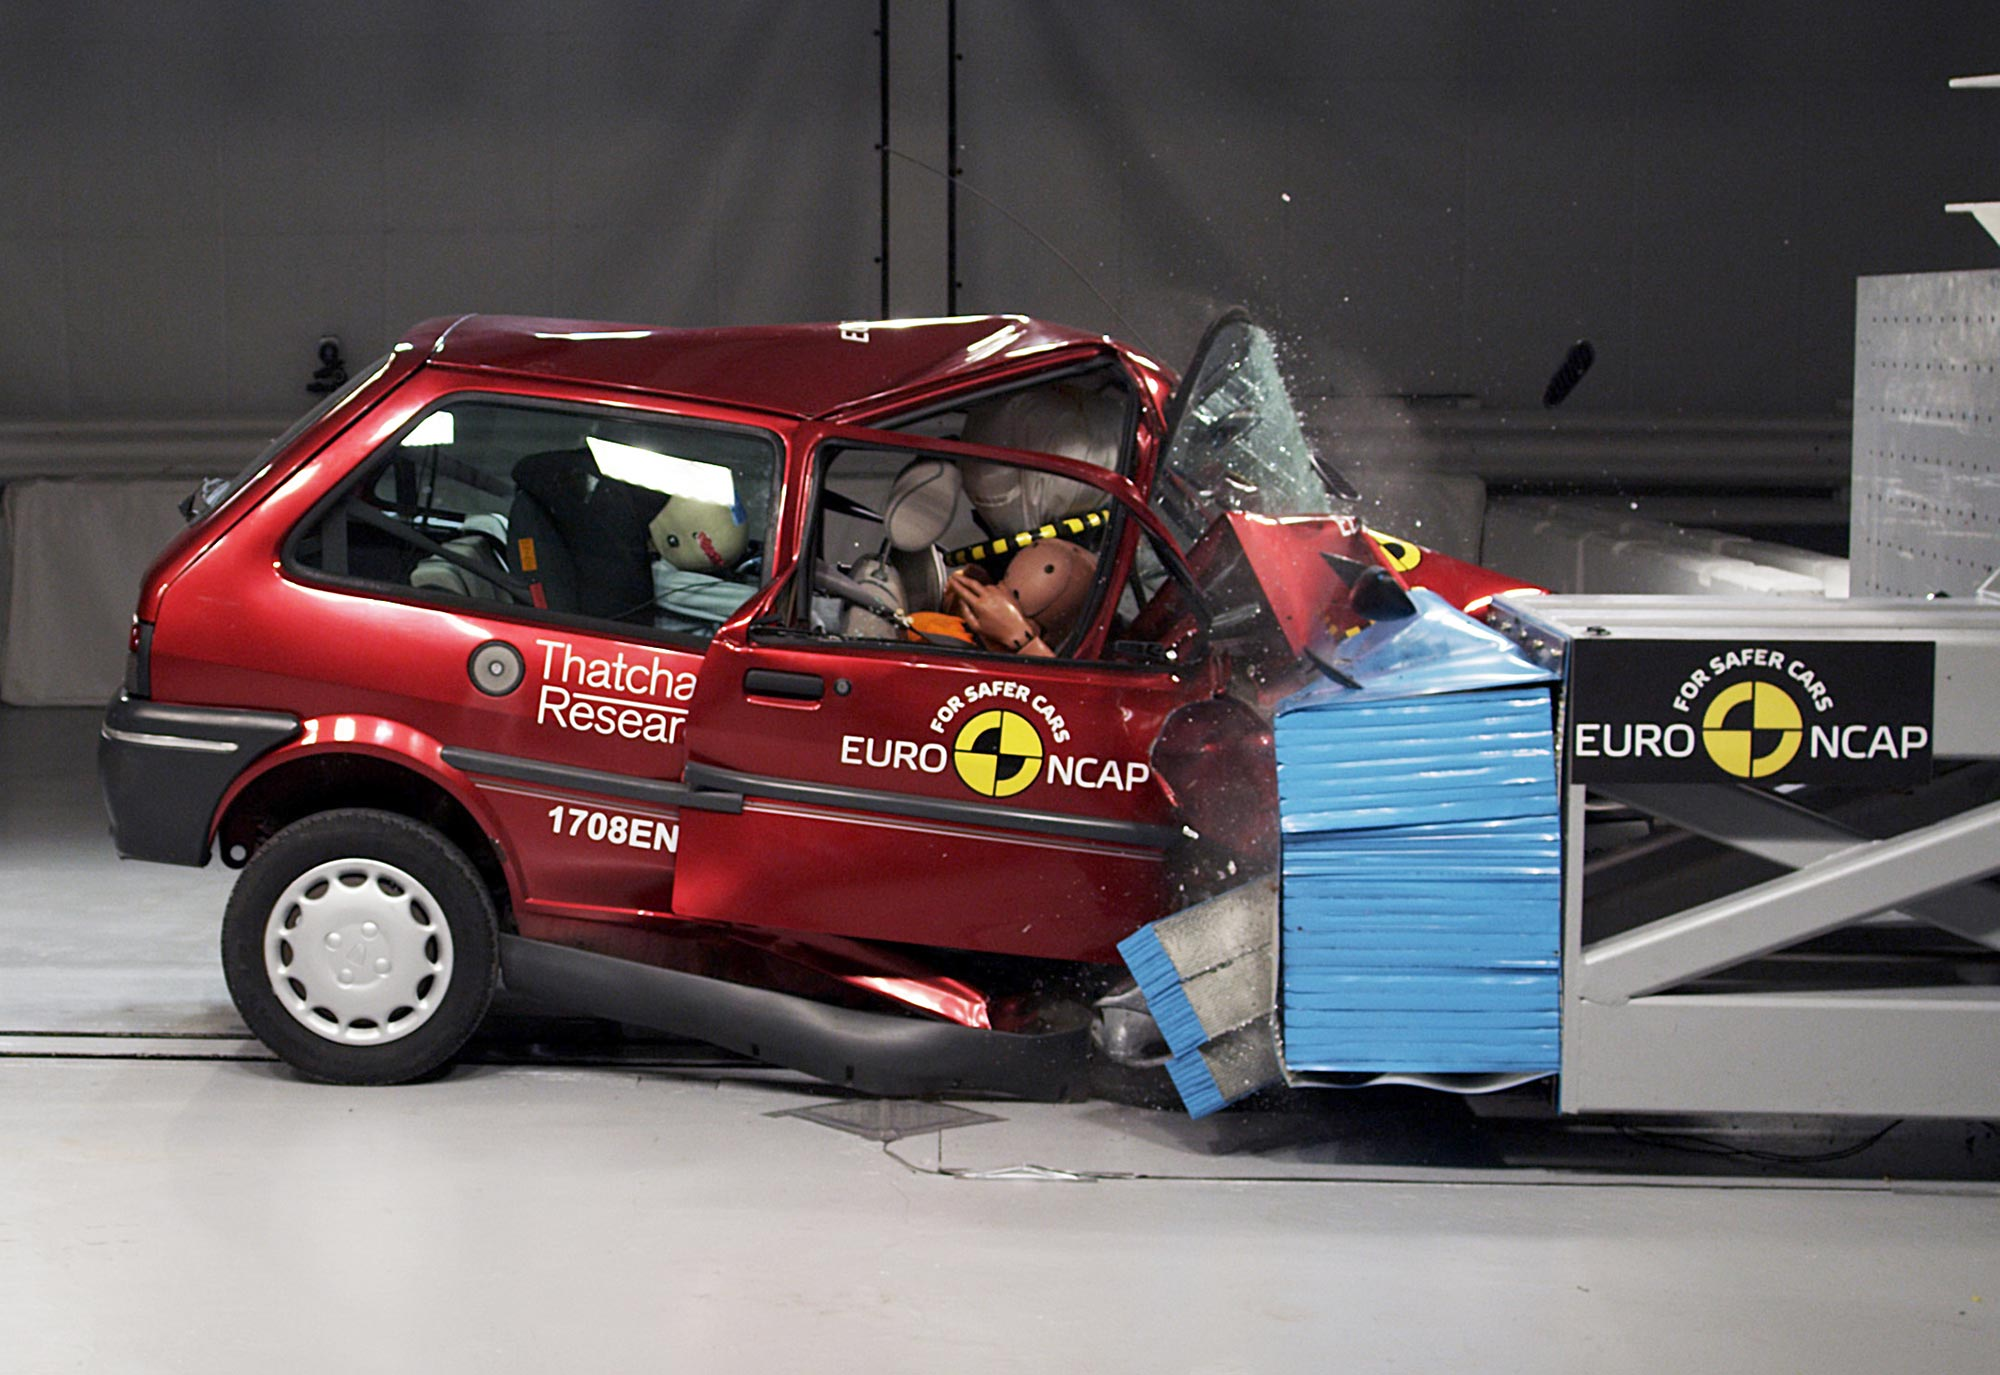 Rover-100-Crash.jpg